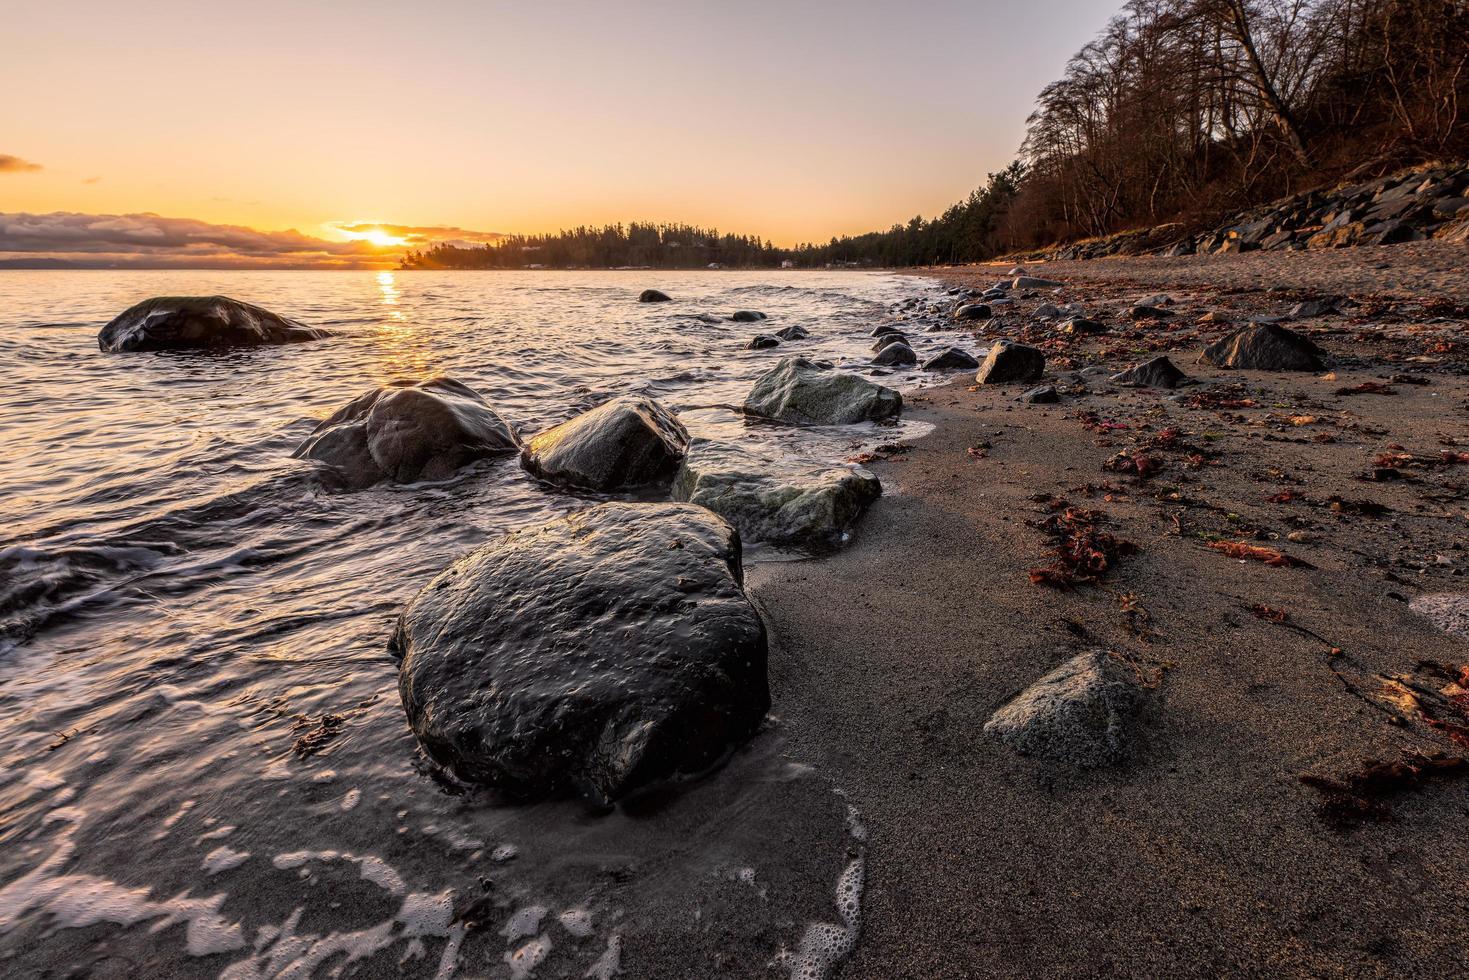 pedras cinza na beira-mar durante o pôr do sol foto